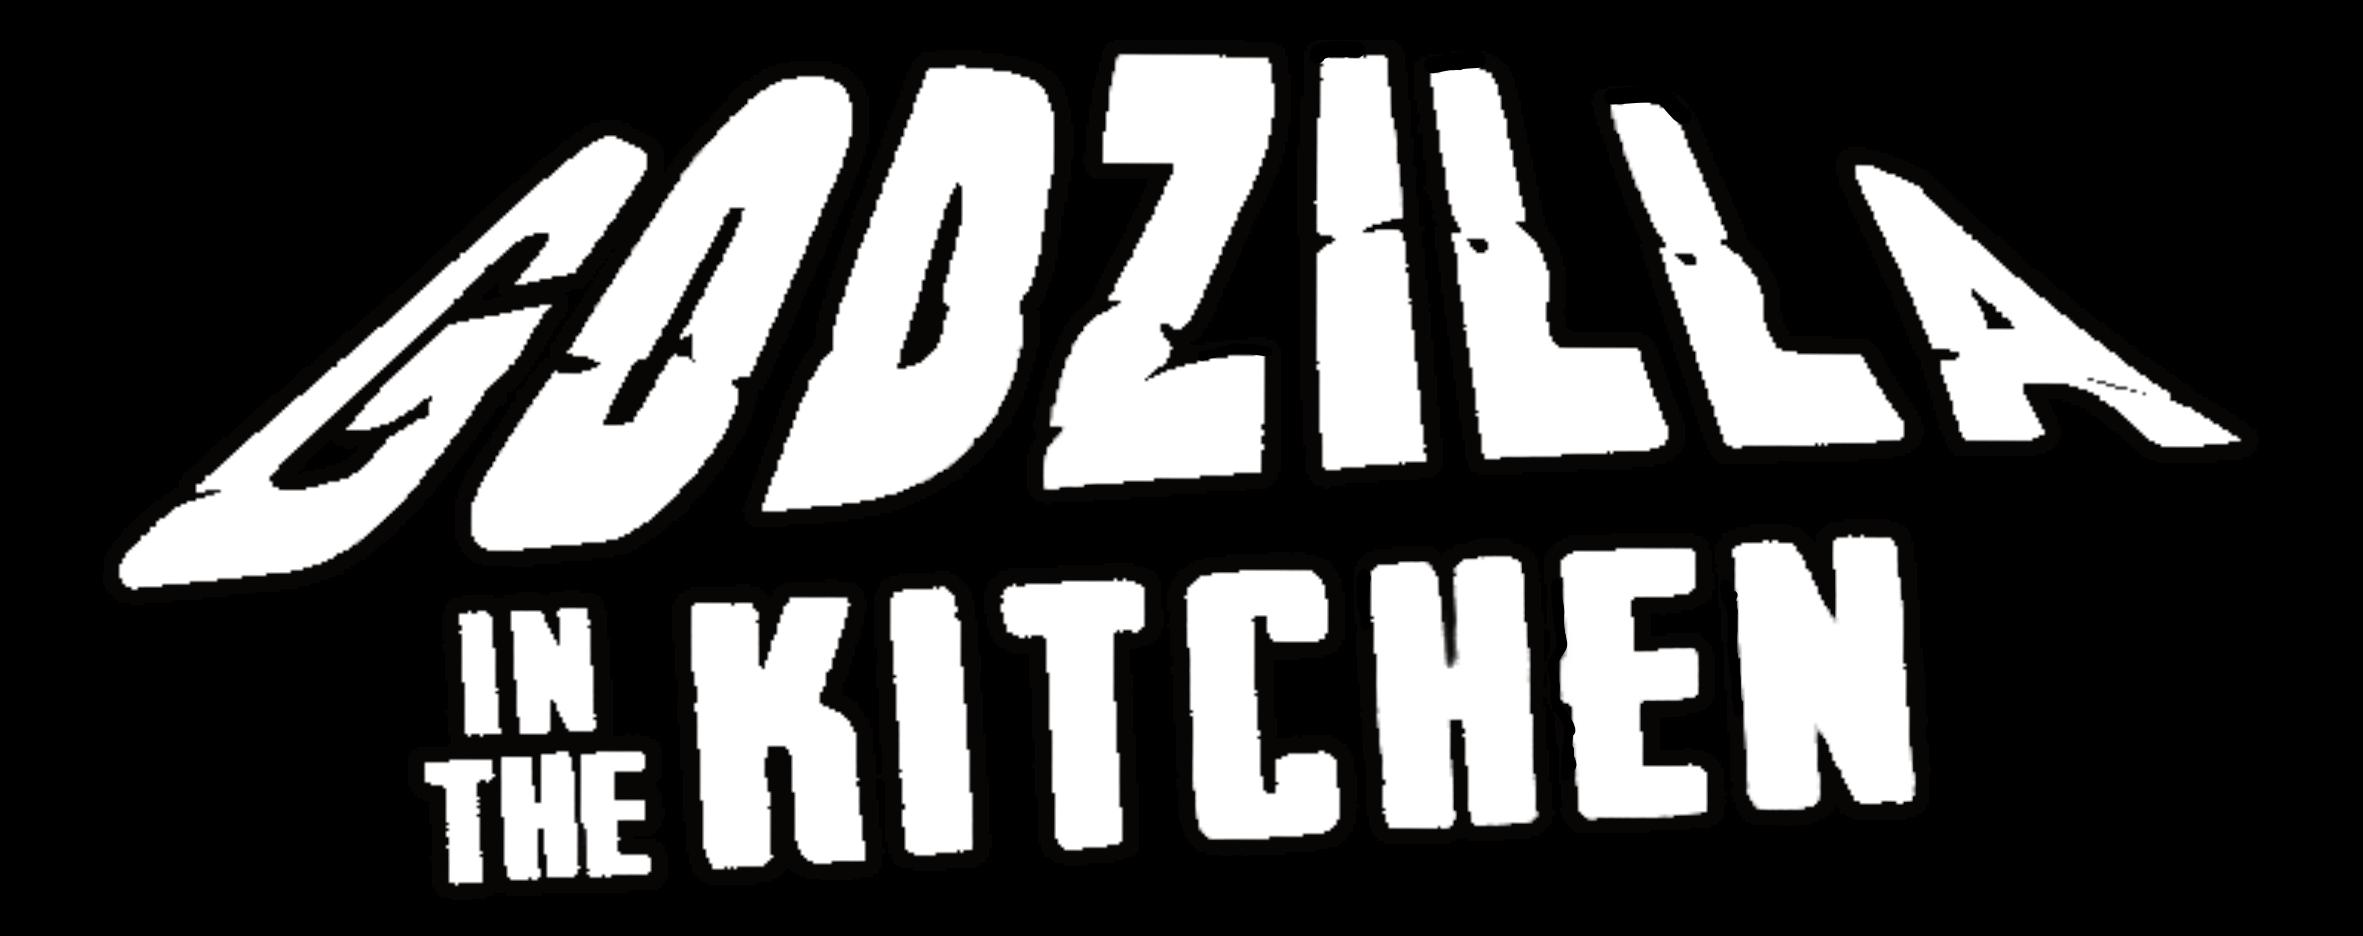 Godzilla In The Kitchen